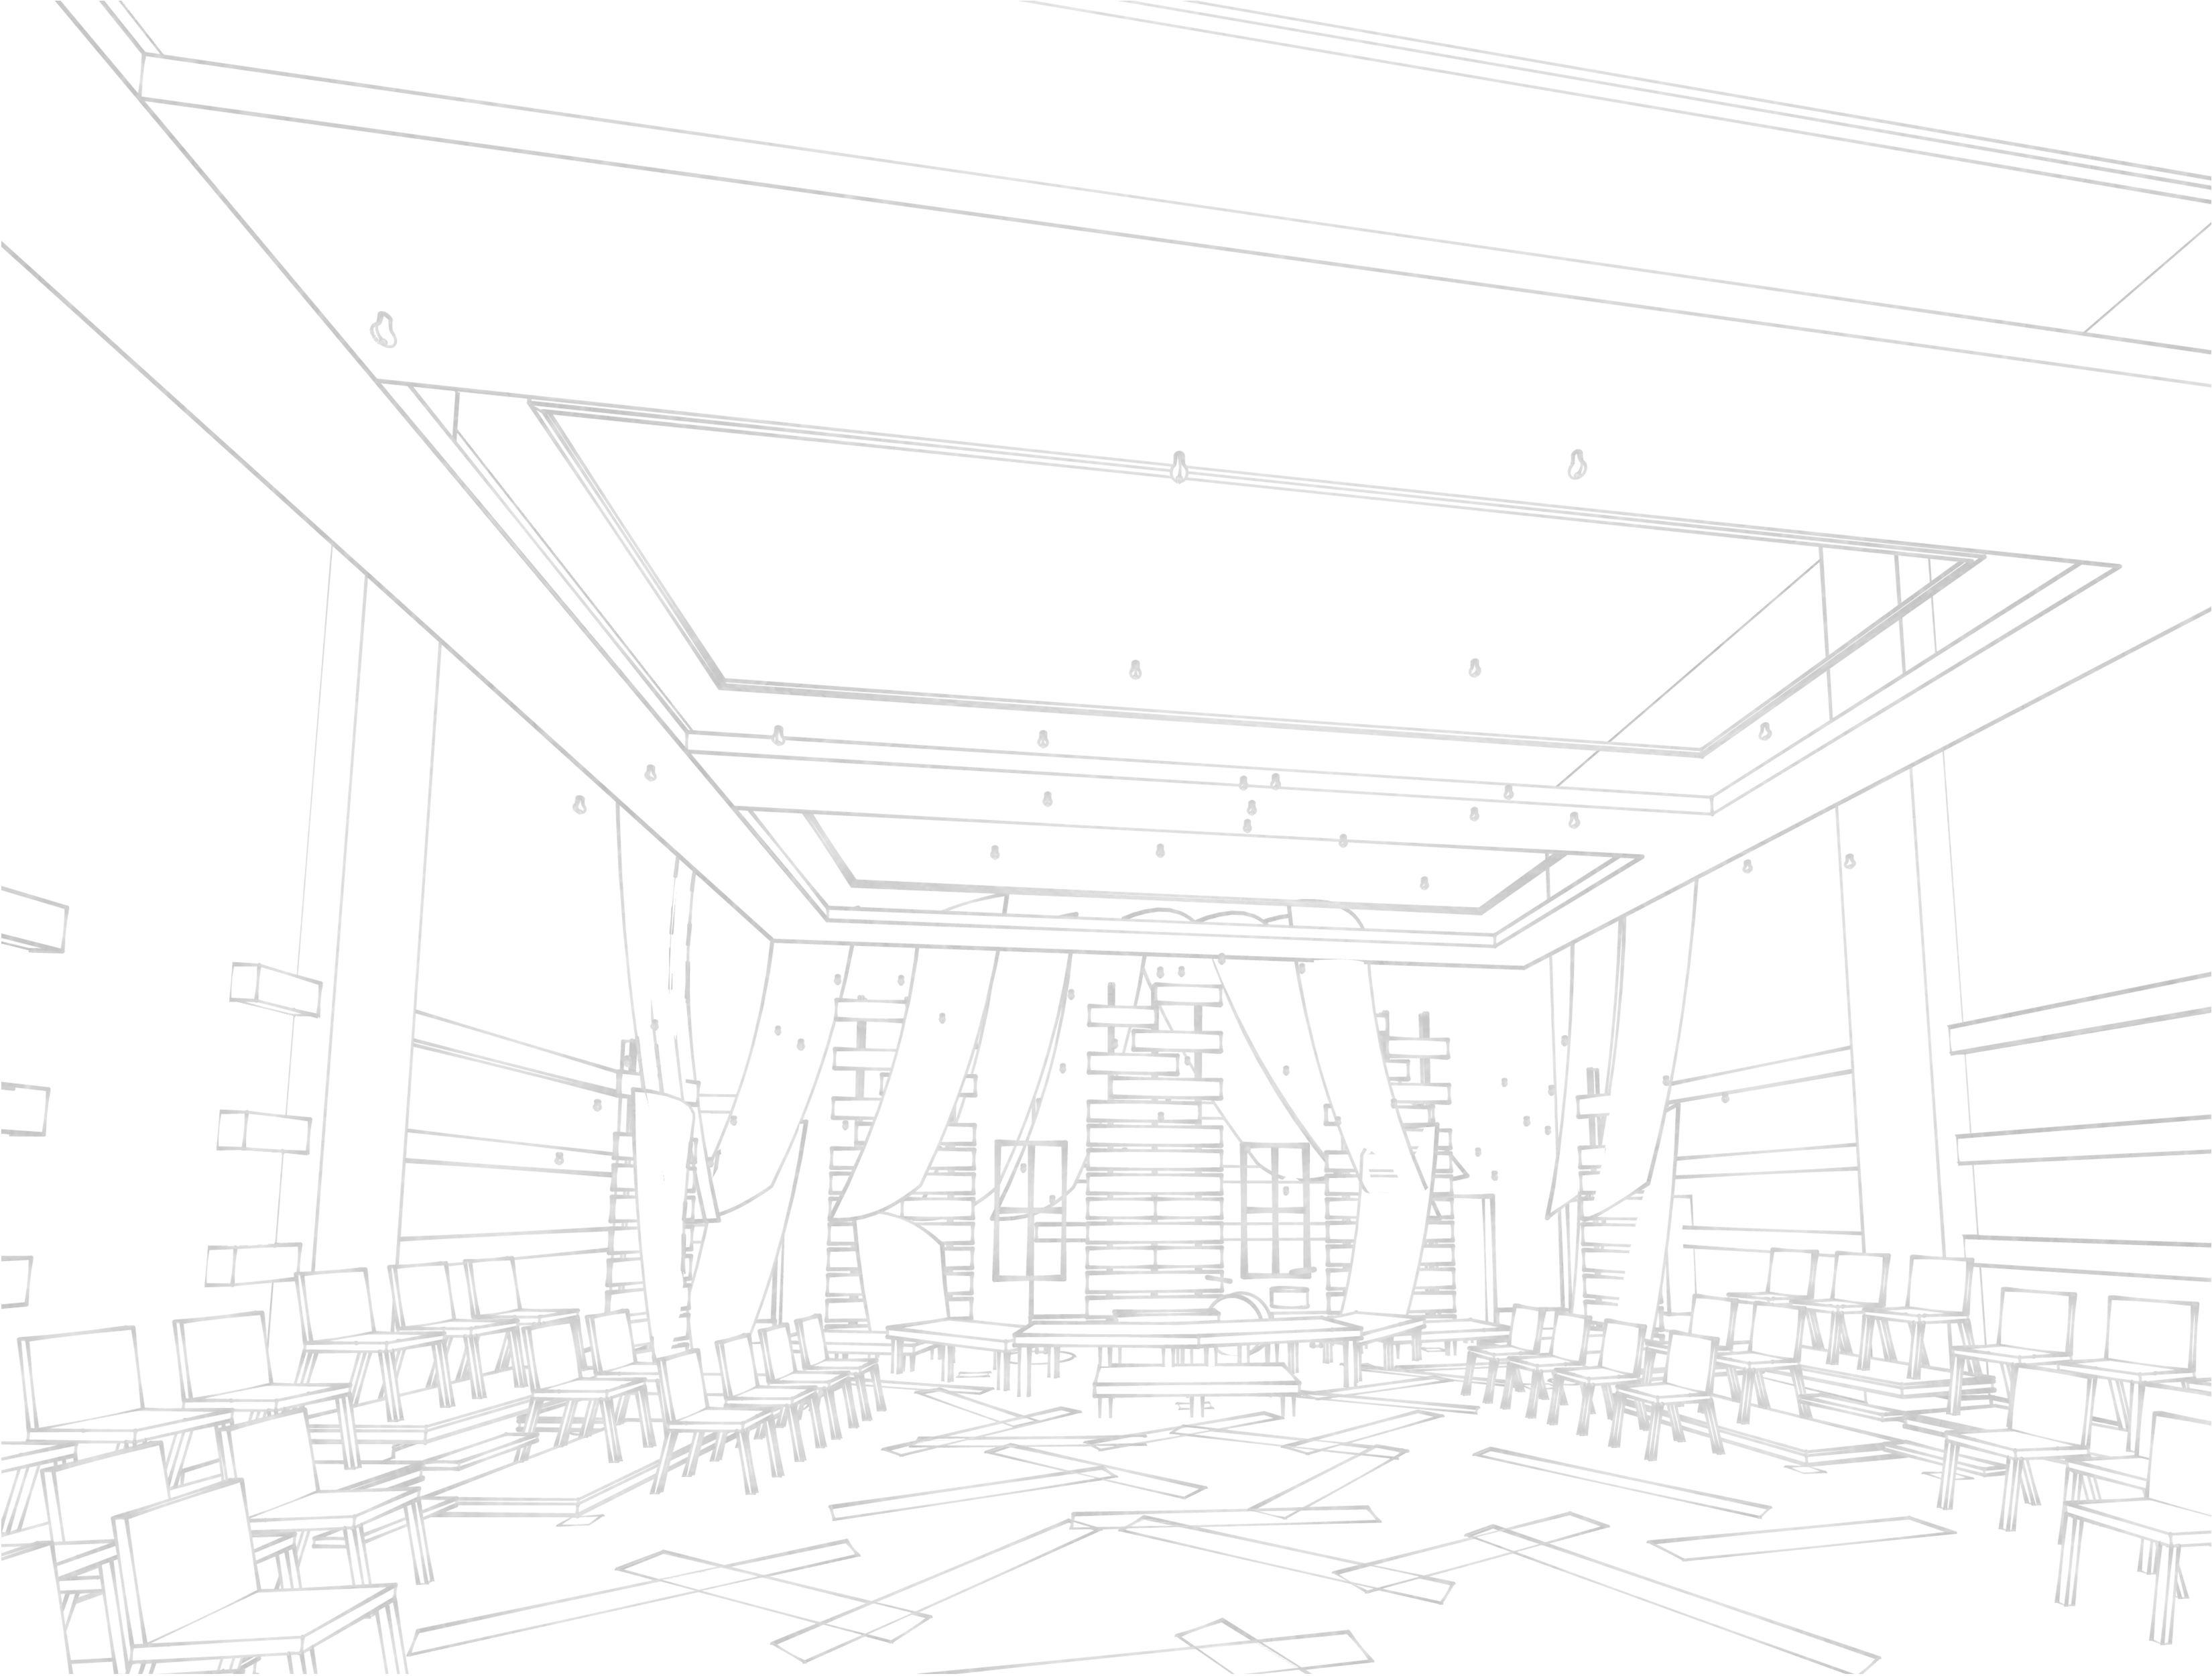 Perspective sketch